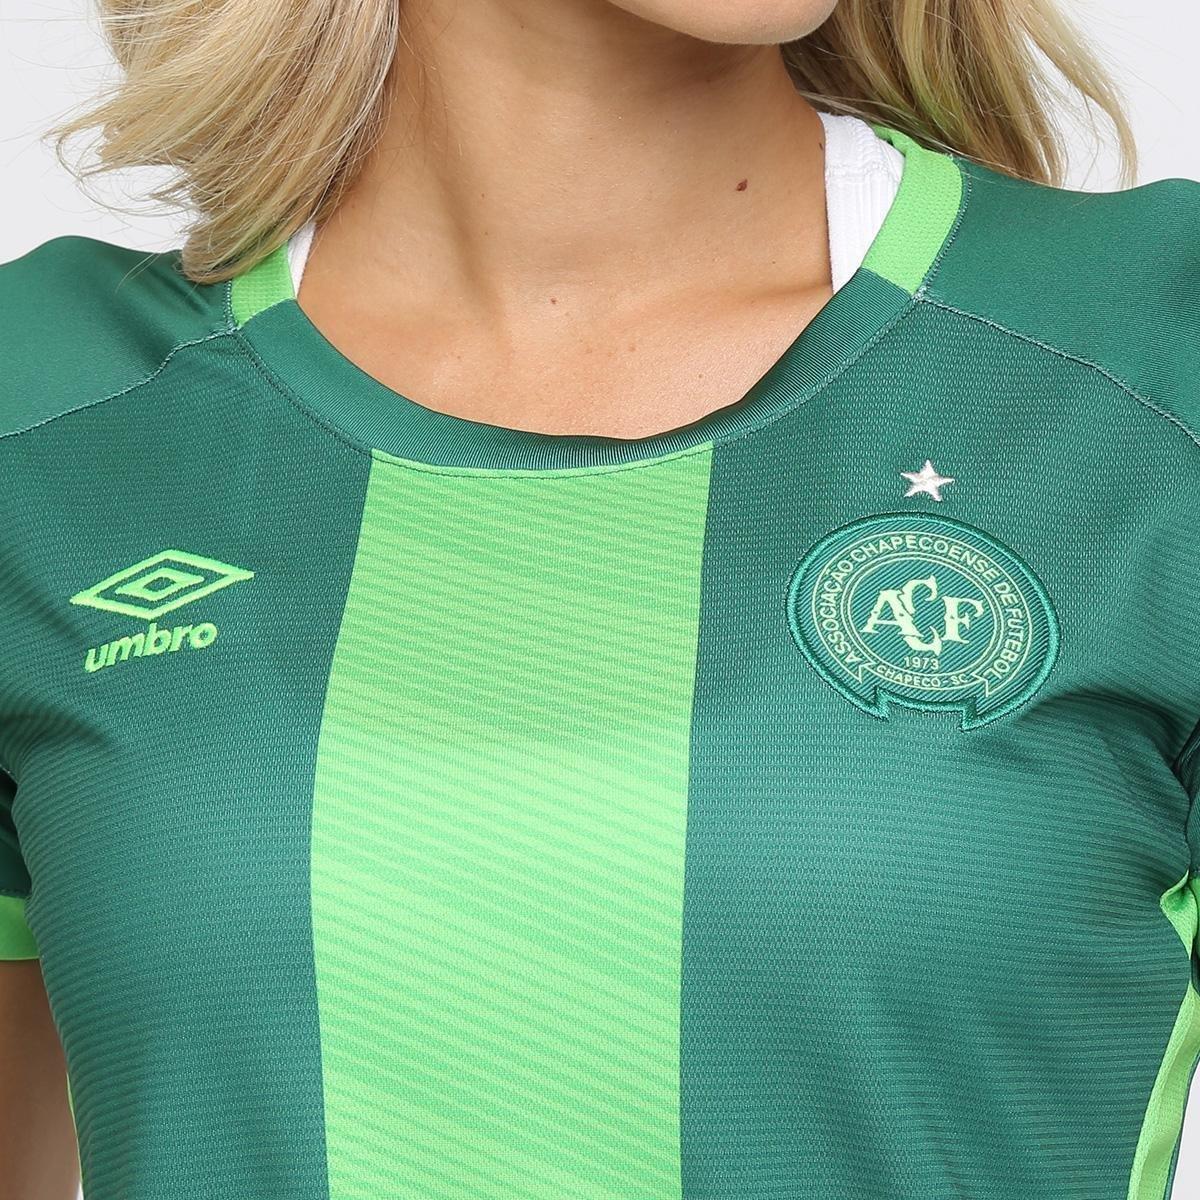 Verde nº 17 s Torcedor 16 III Umbro Chapecoense Feminina Camisa gw7xpfg